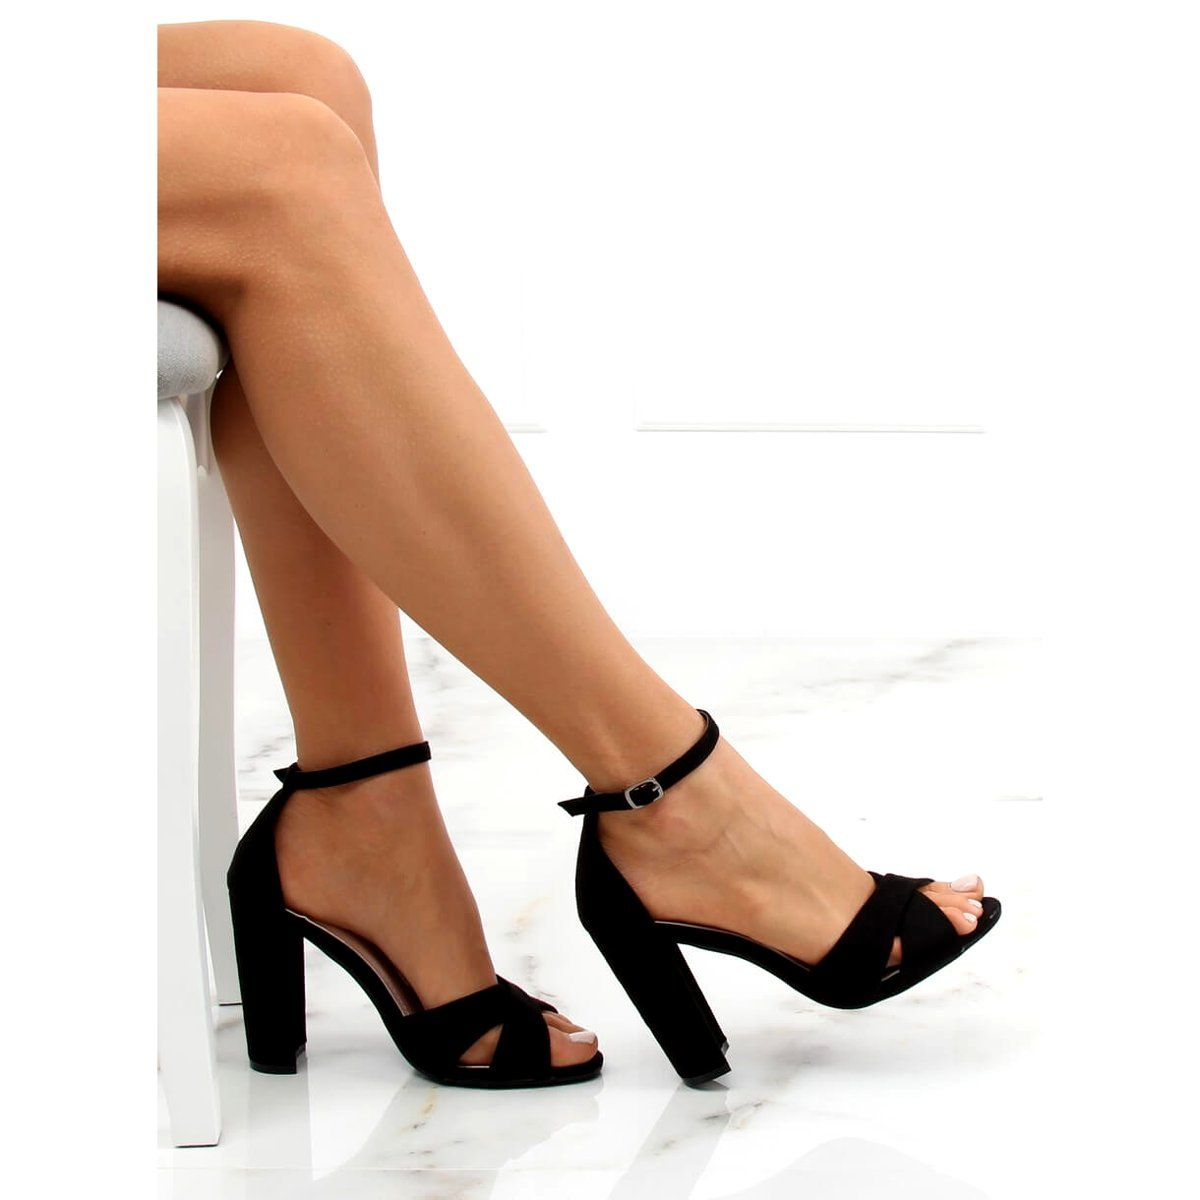 Sandalki Na Slupku Czarne 369 34 Black Heels Shoes Heeled Mules